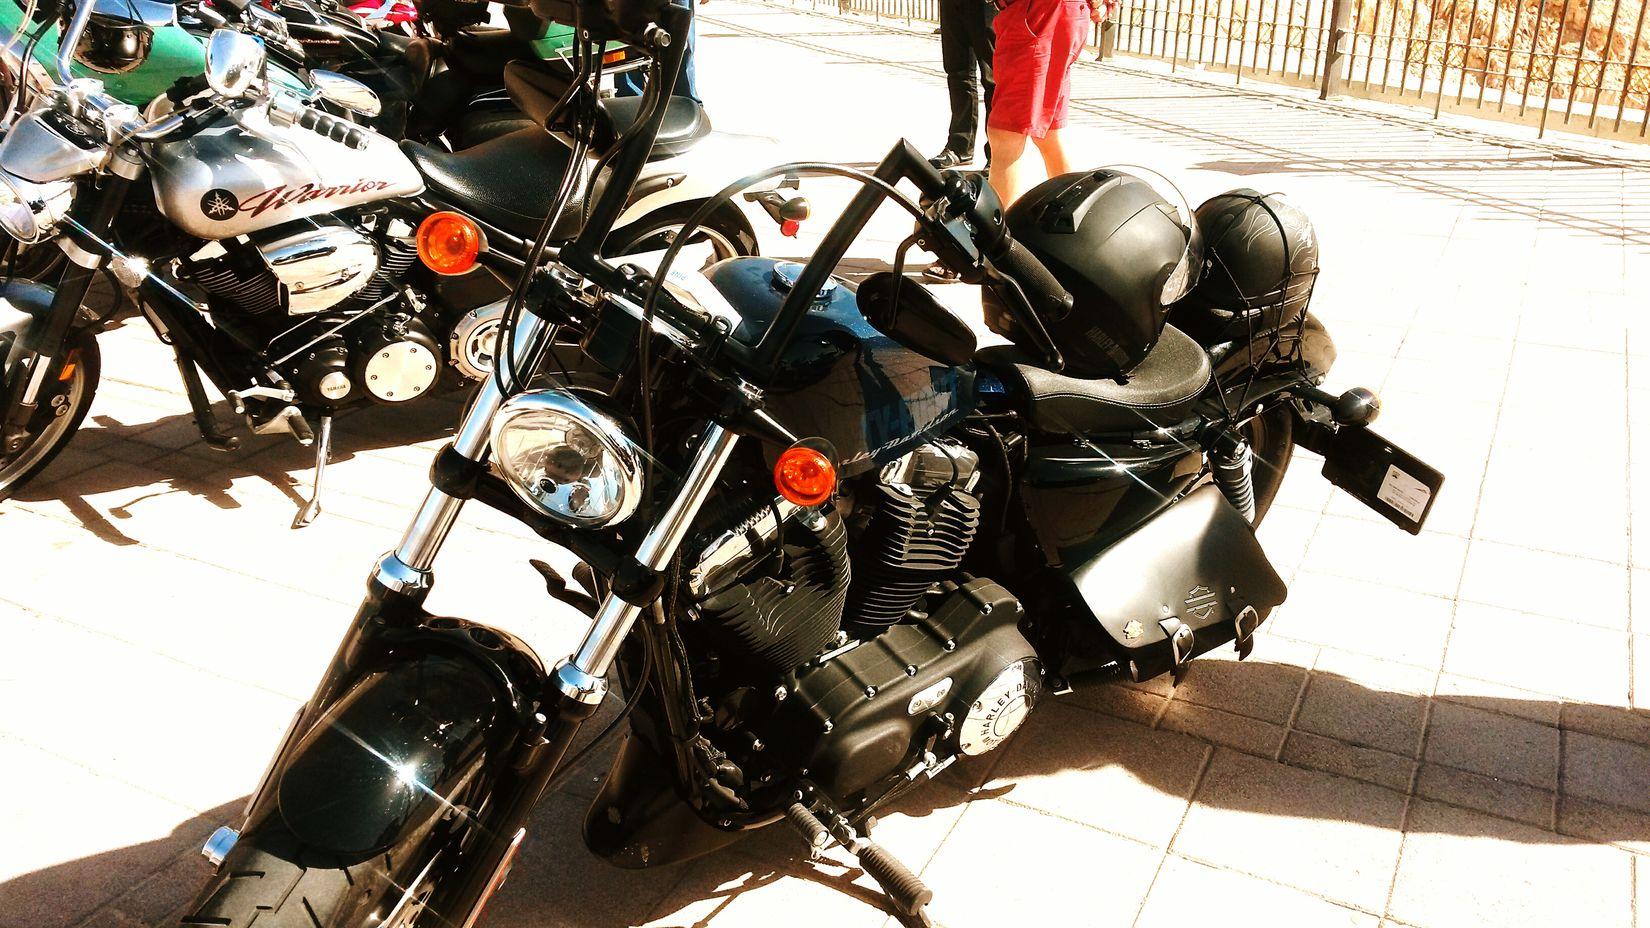 Beauty.......good for a ride... Brothersbike Bikers Bikelove Bike Harleydavidson Jabelhafeet Dubai Dubaicity Cityscapes Cityscape